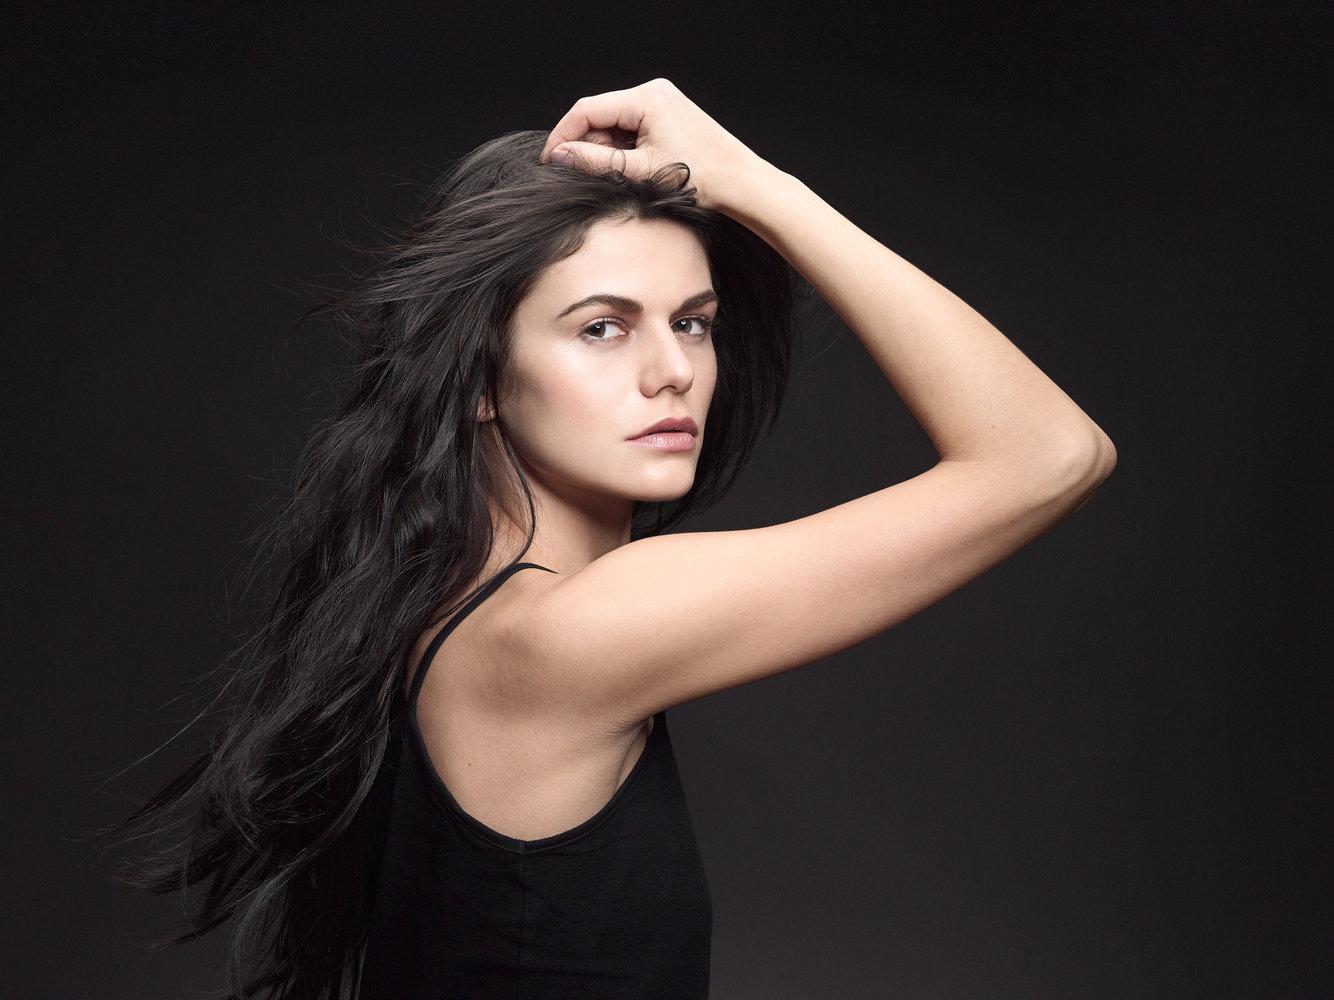 Hair and Beauty shoot